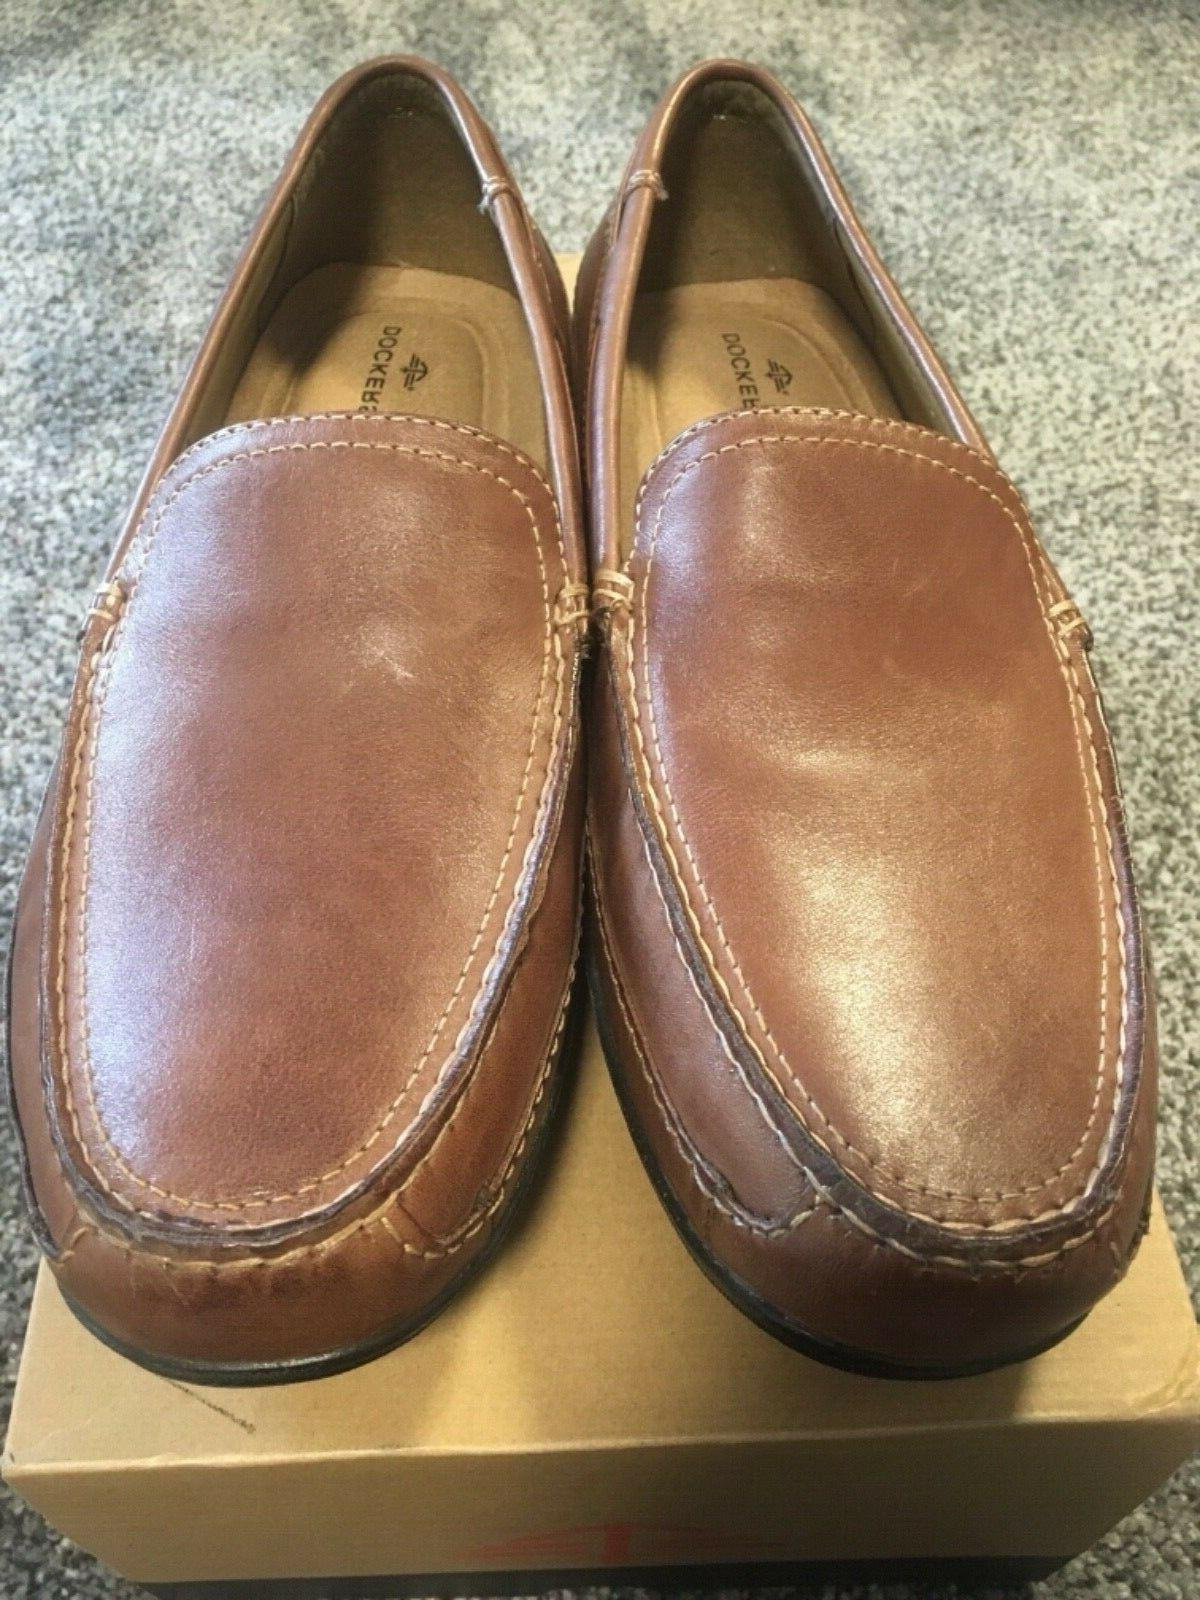 Dockers Men's Loafers 11.5 NEW